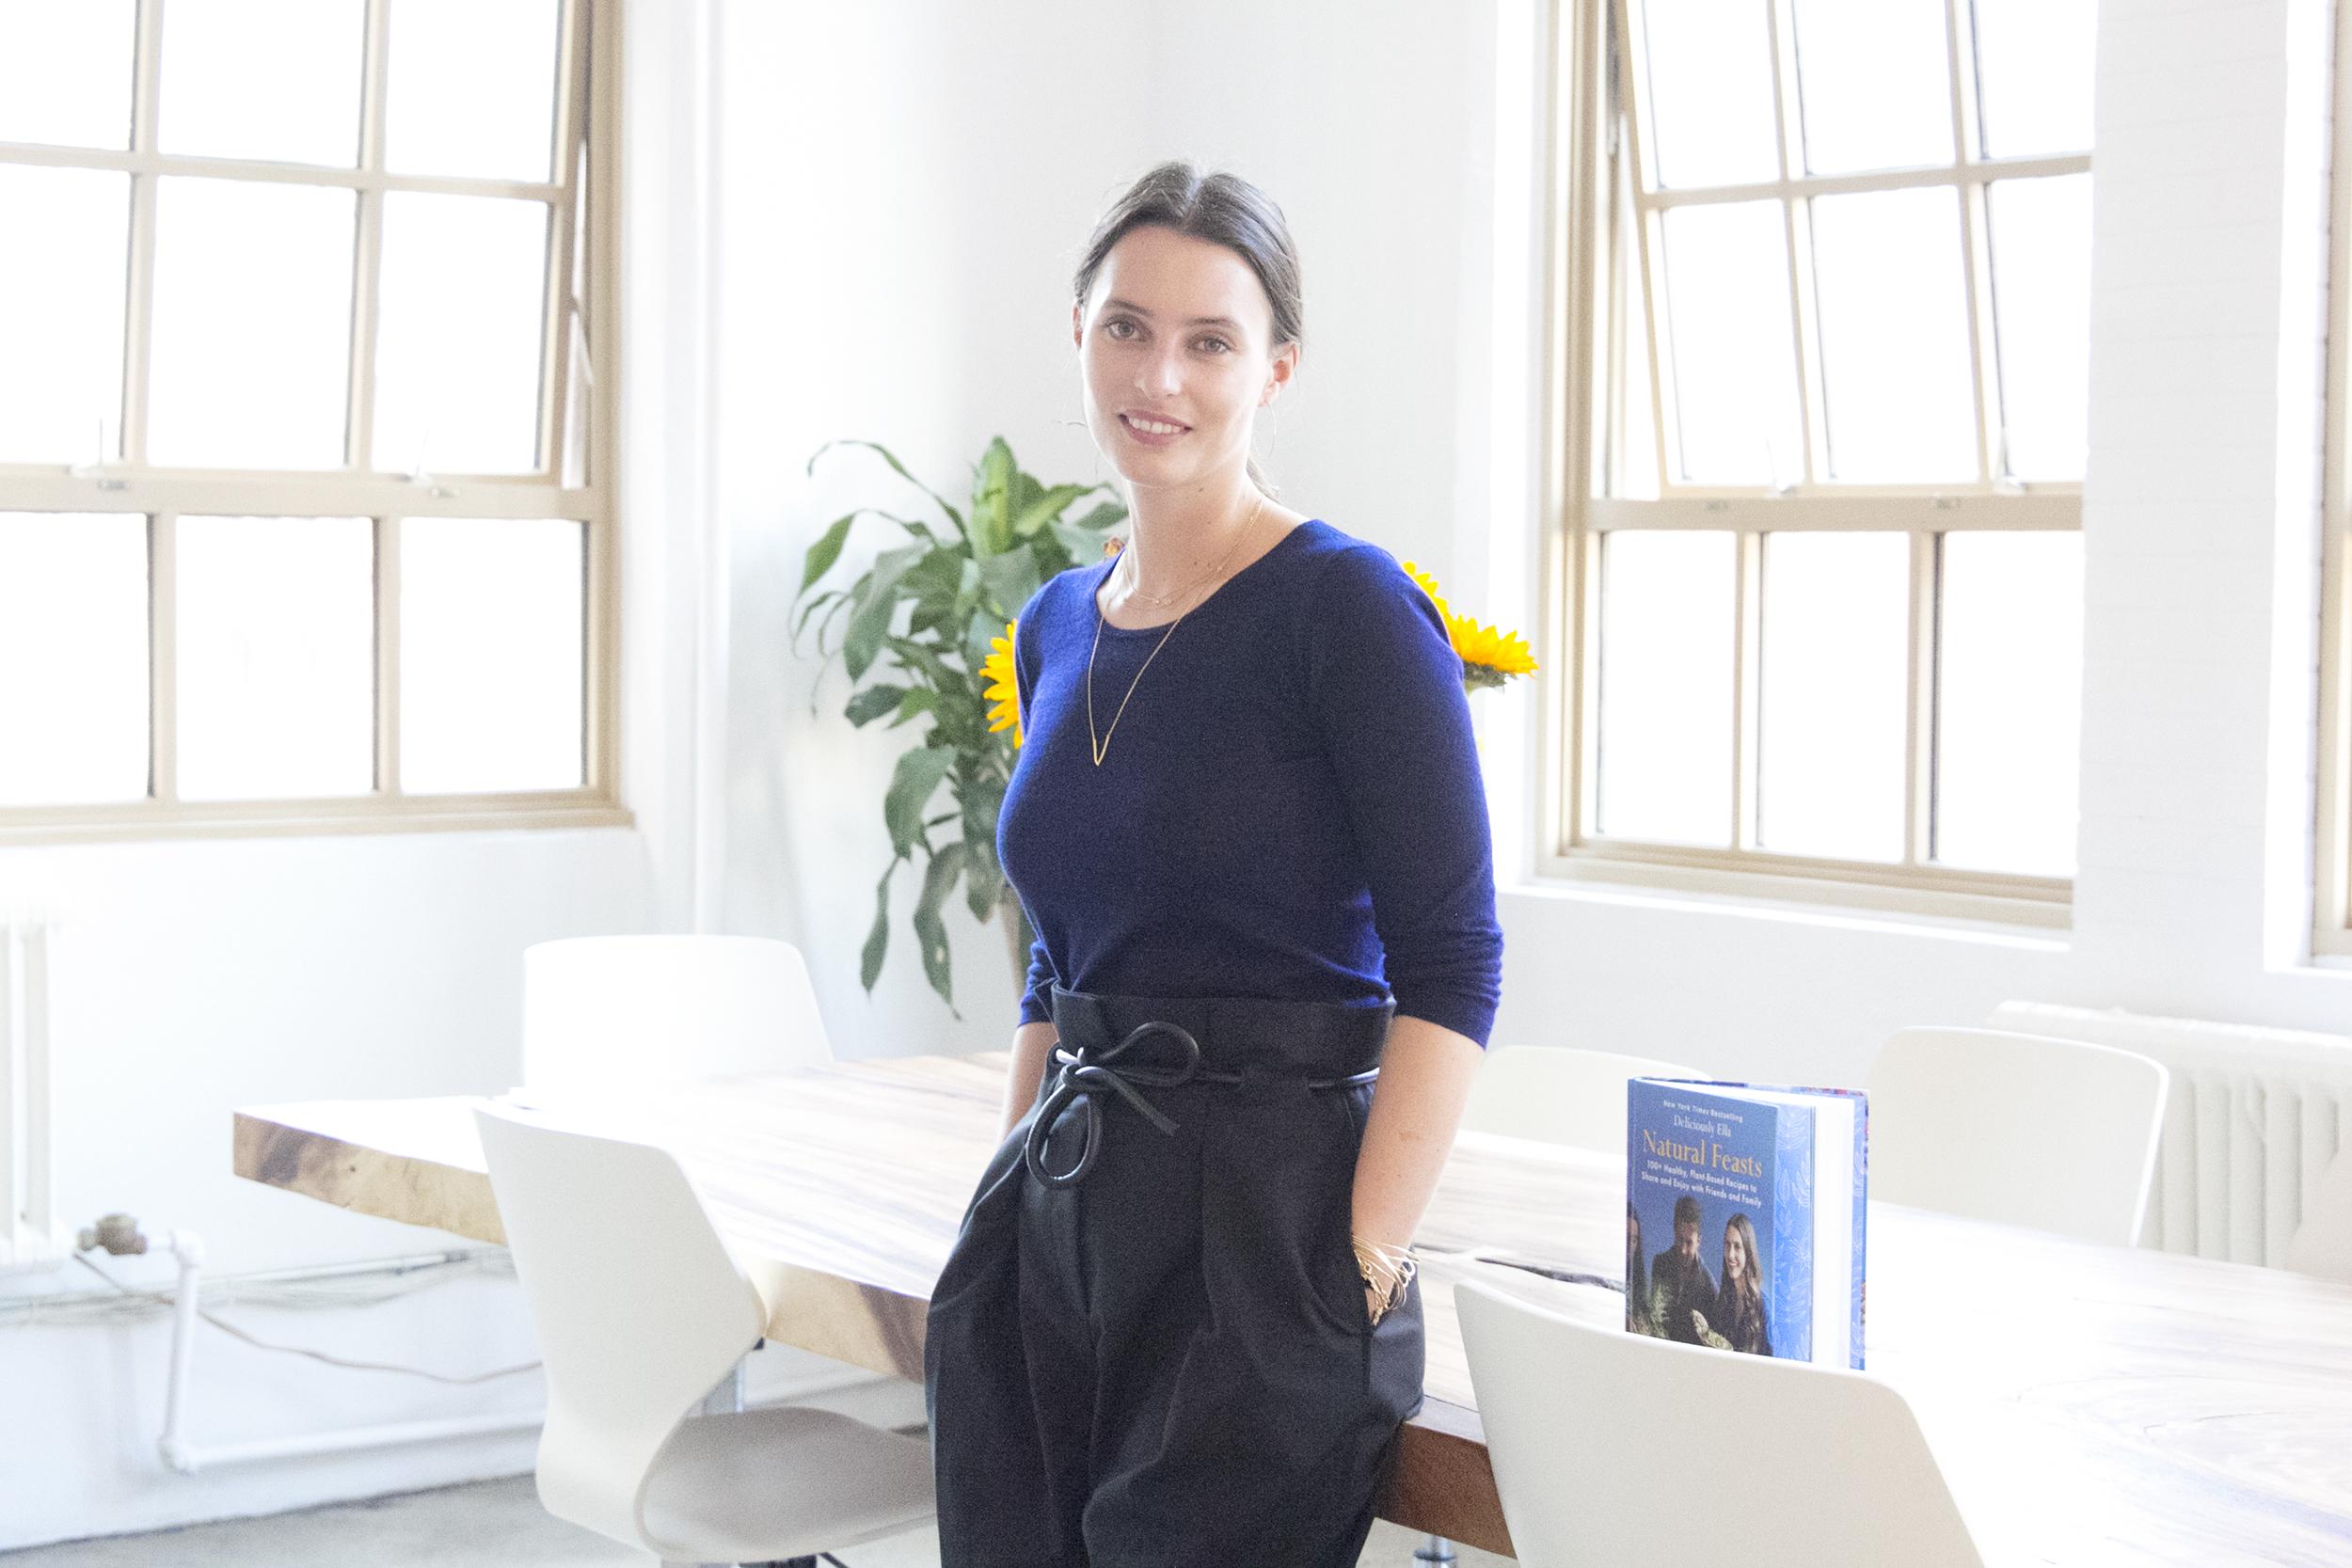 Deliciously Ella founder, Ella Mills on entrepreneurship